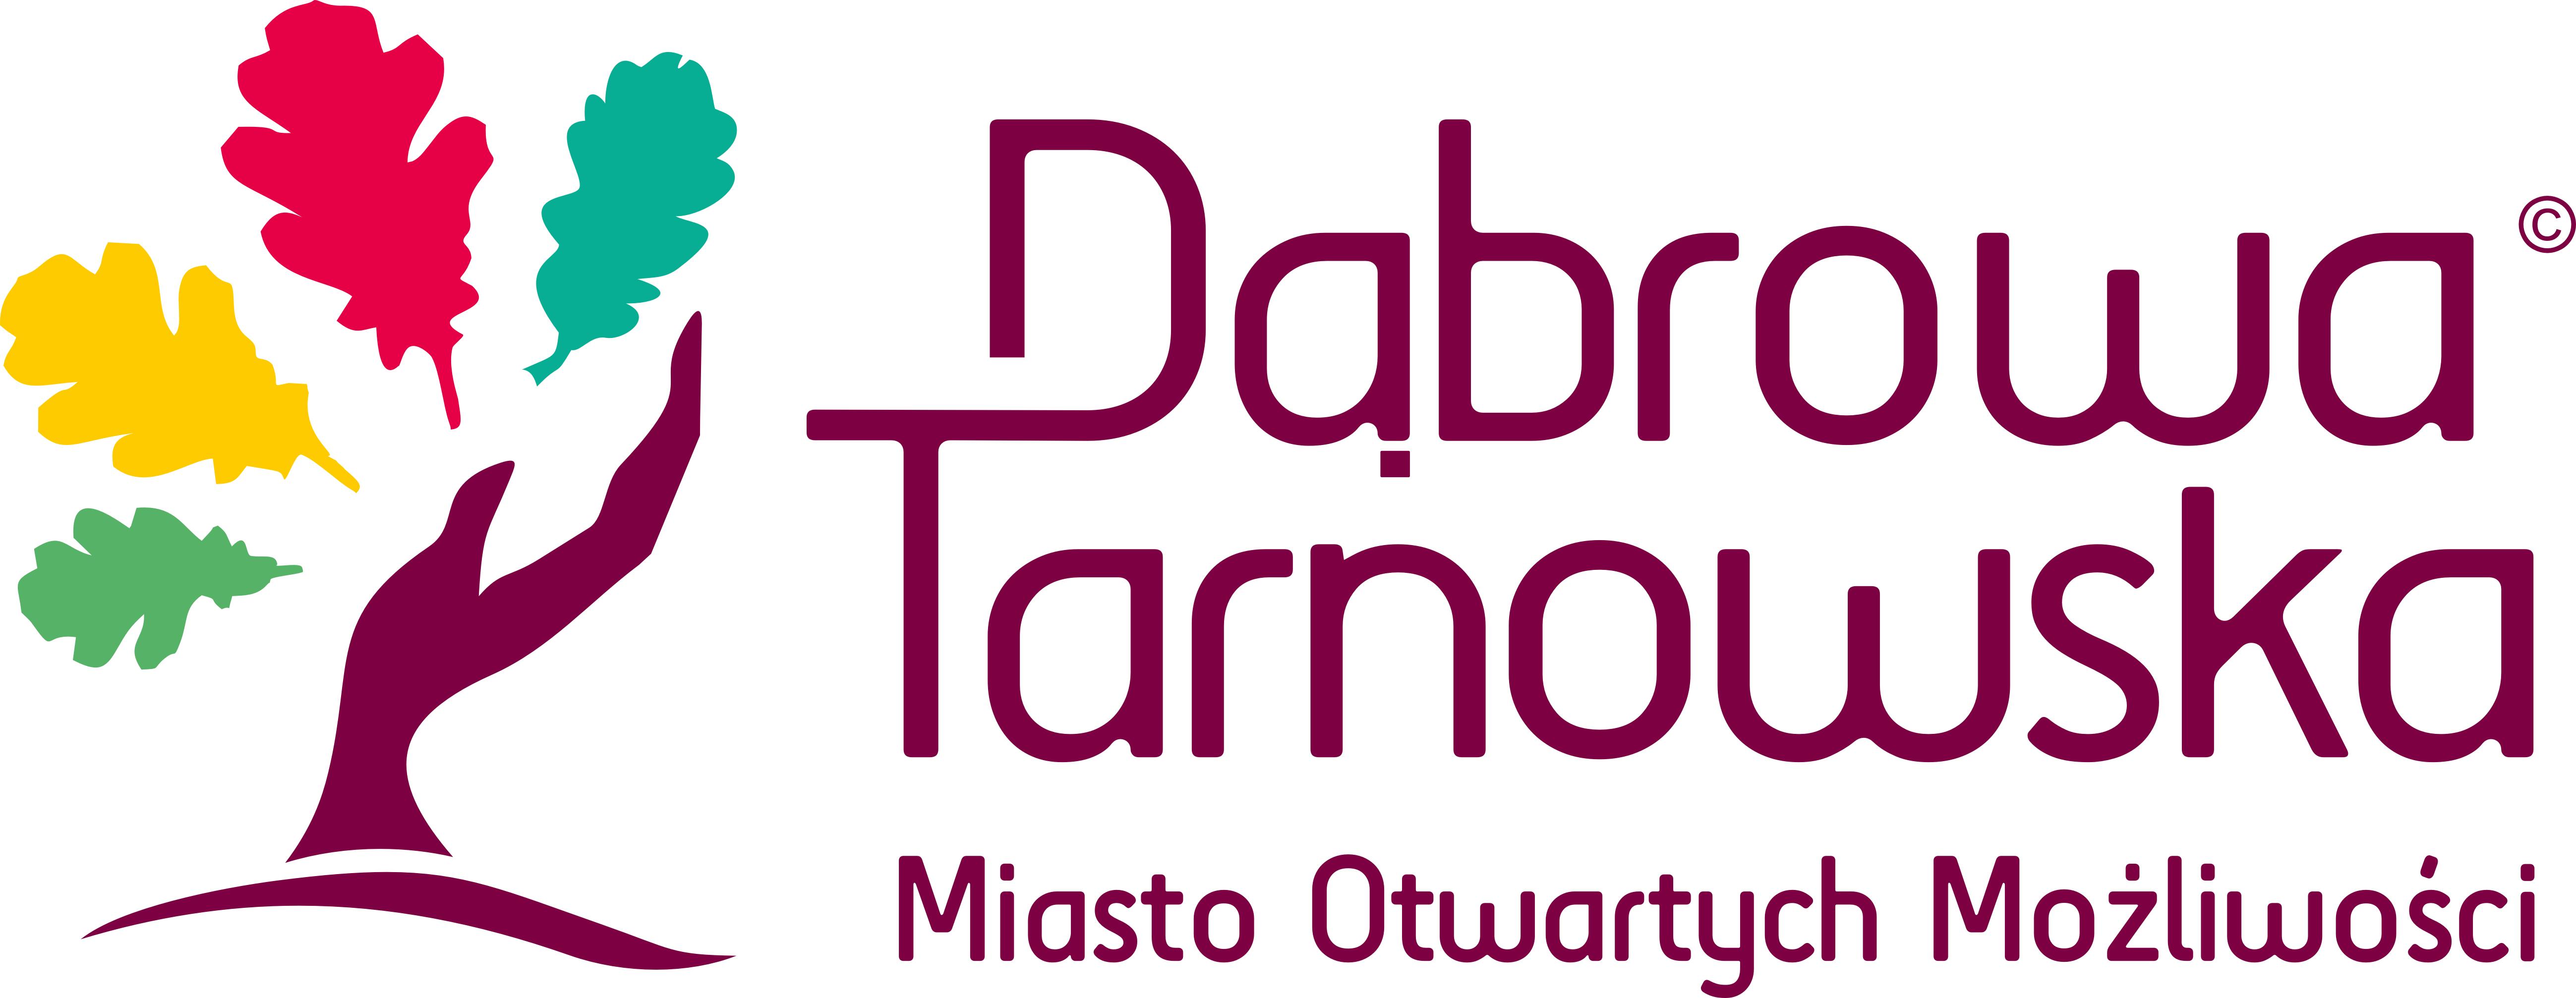 Dąbrowa Tarnowska